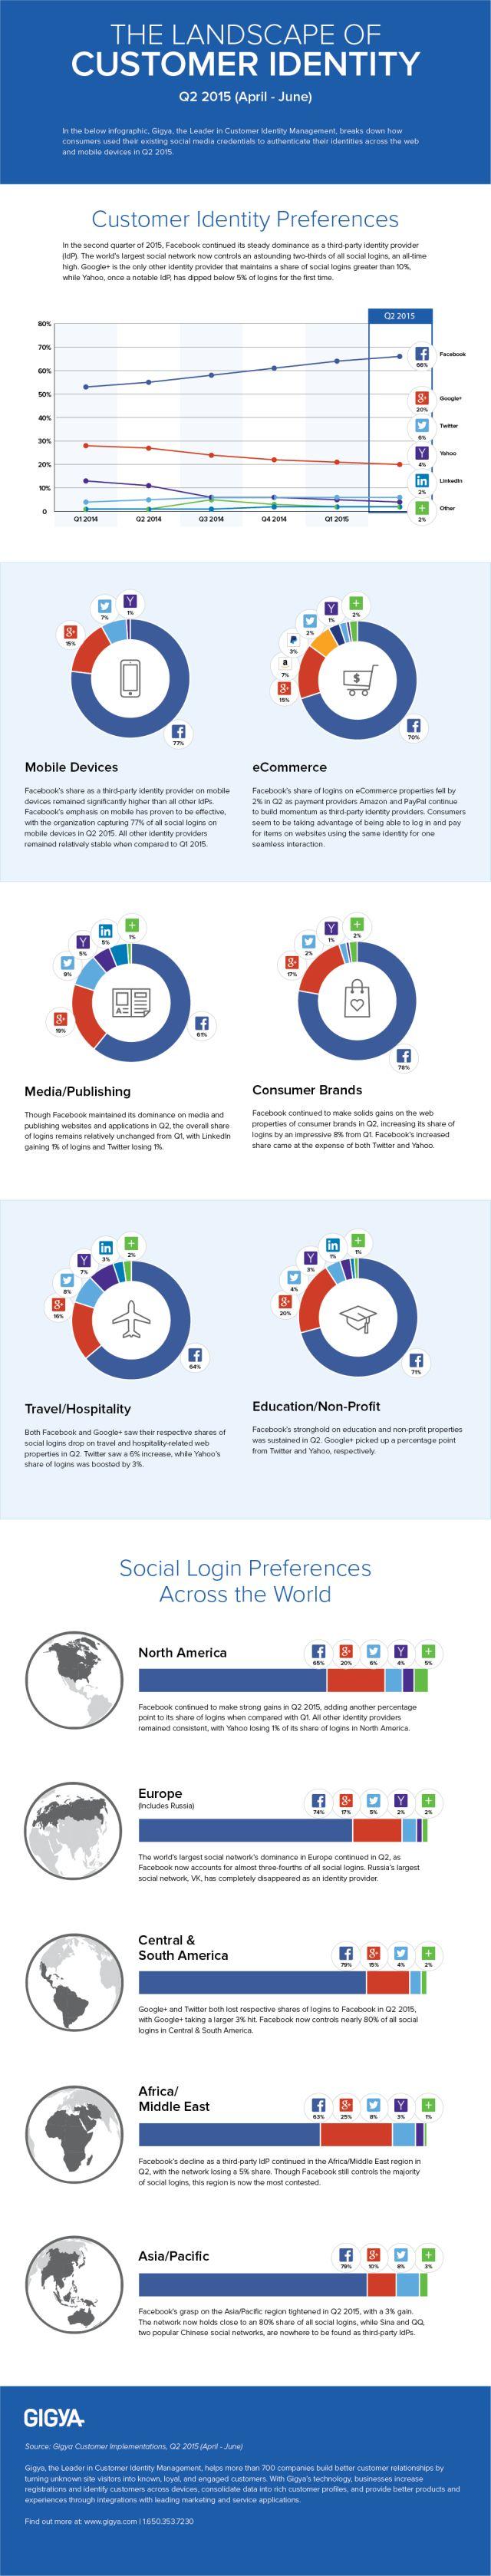 Gigya_Infographic_Q2_Social_Login_Final http://www.adweek.com/socialtimes/q2-facebook-still-most-popular-social-login-provider-infographic/623914